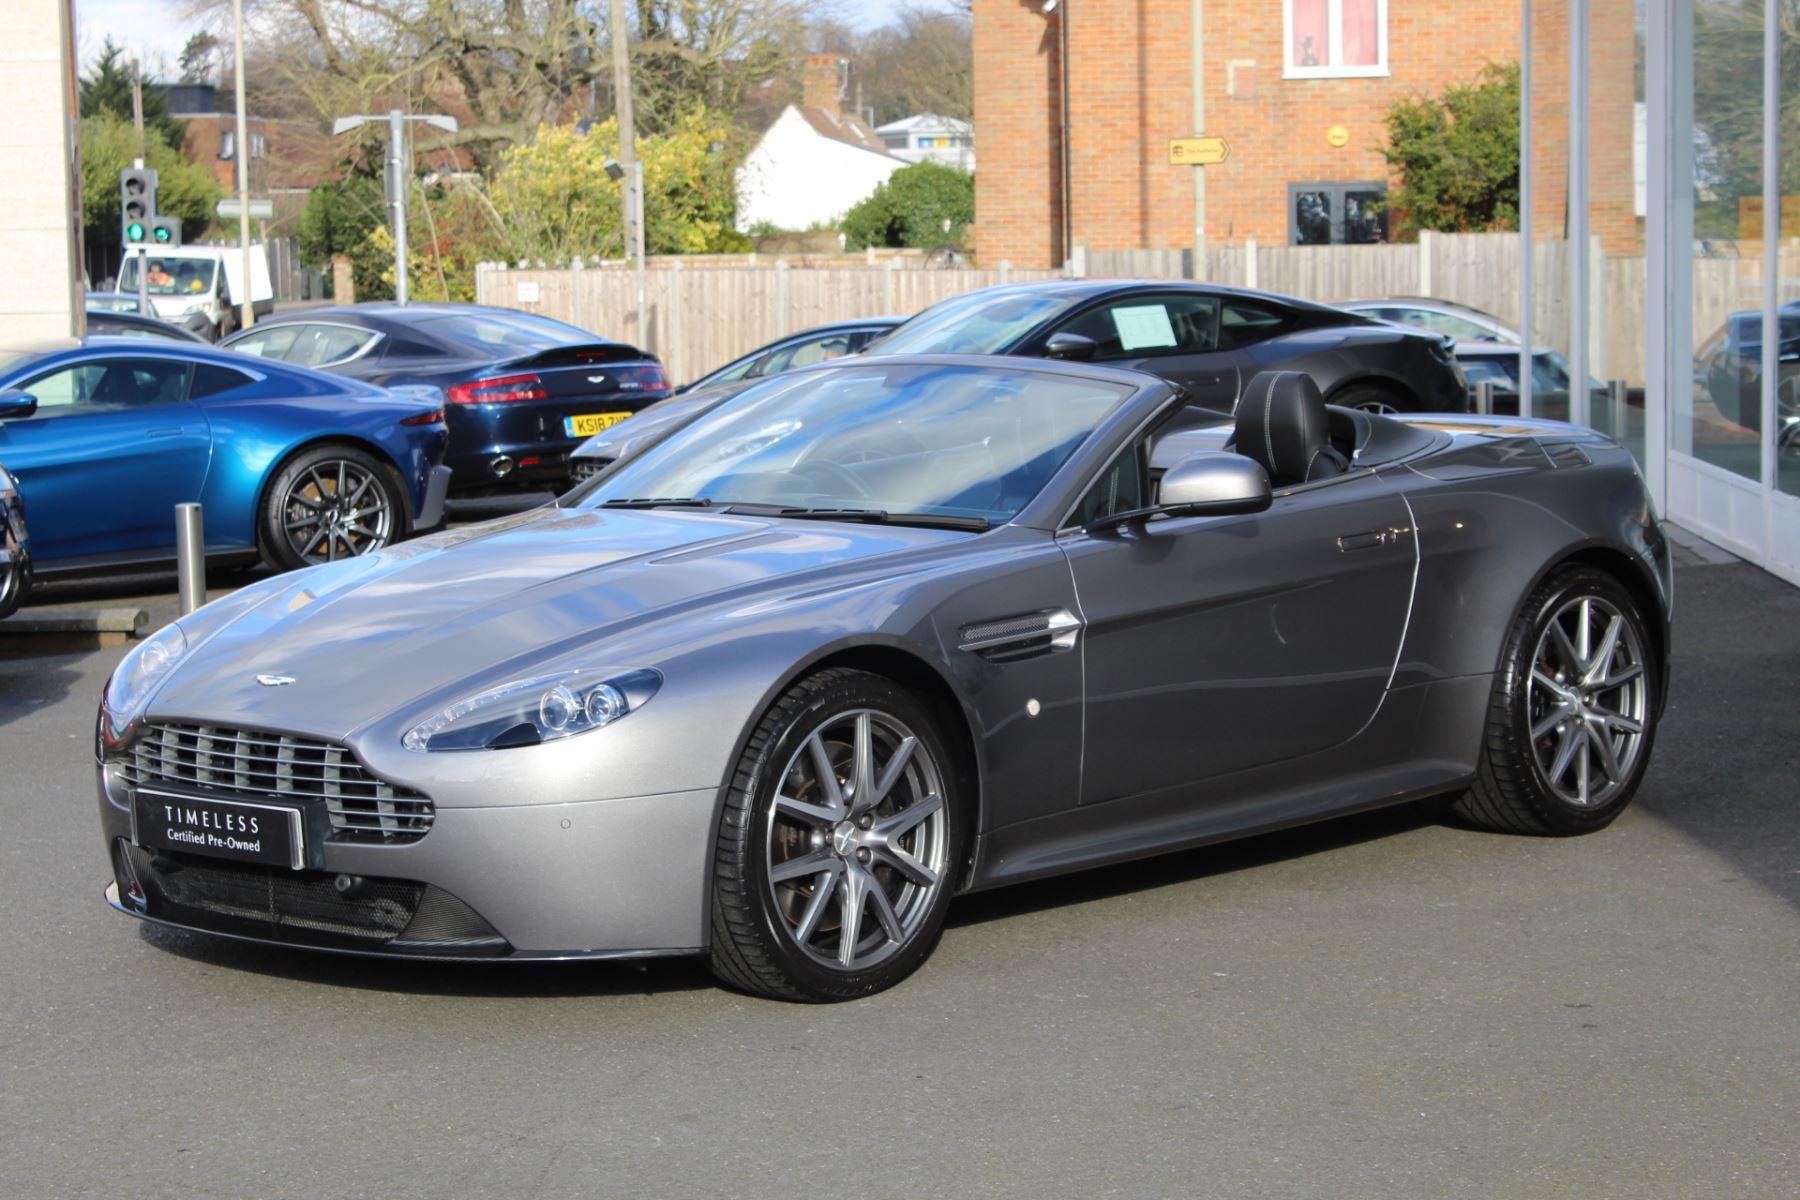 Aston Martin V8 Vantage S Roadster S 2dr Sportshift  Rare S Model  image 5